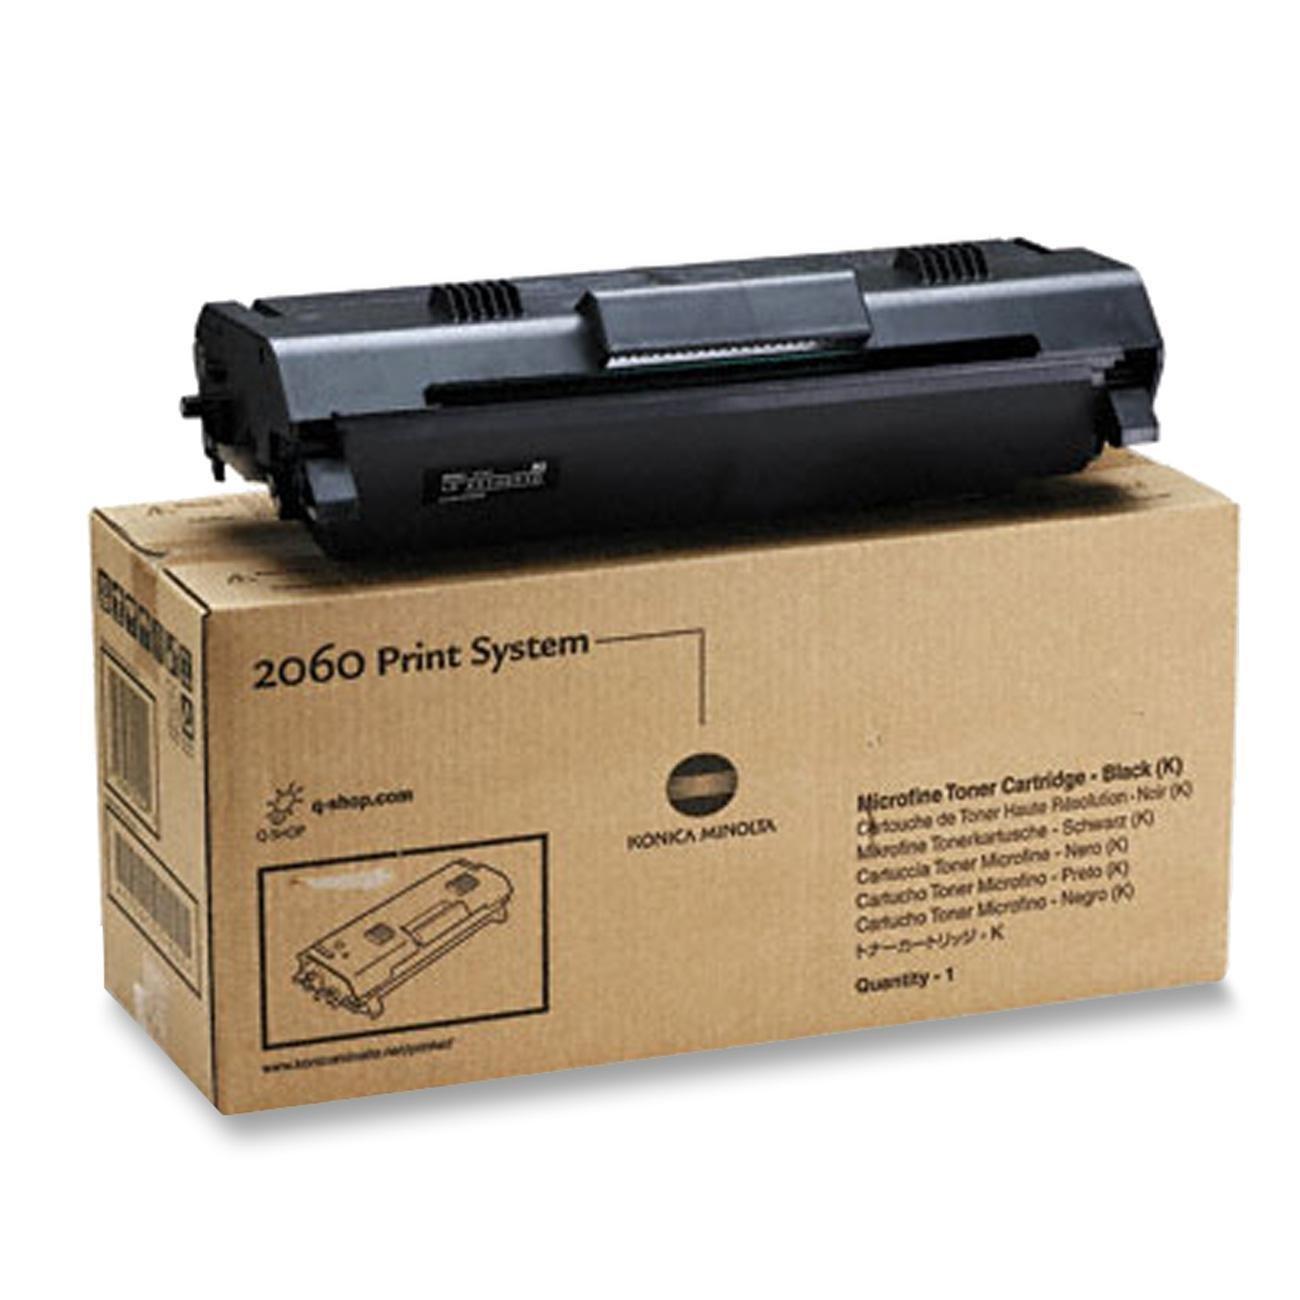 Konica Minolta 1710434-001 Laser Imaging Drum - Black